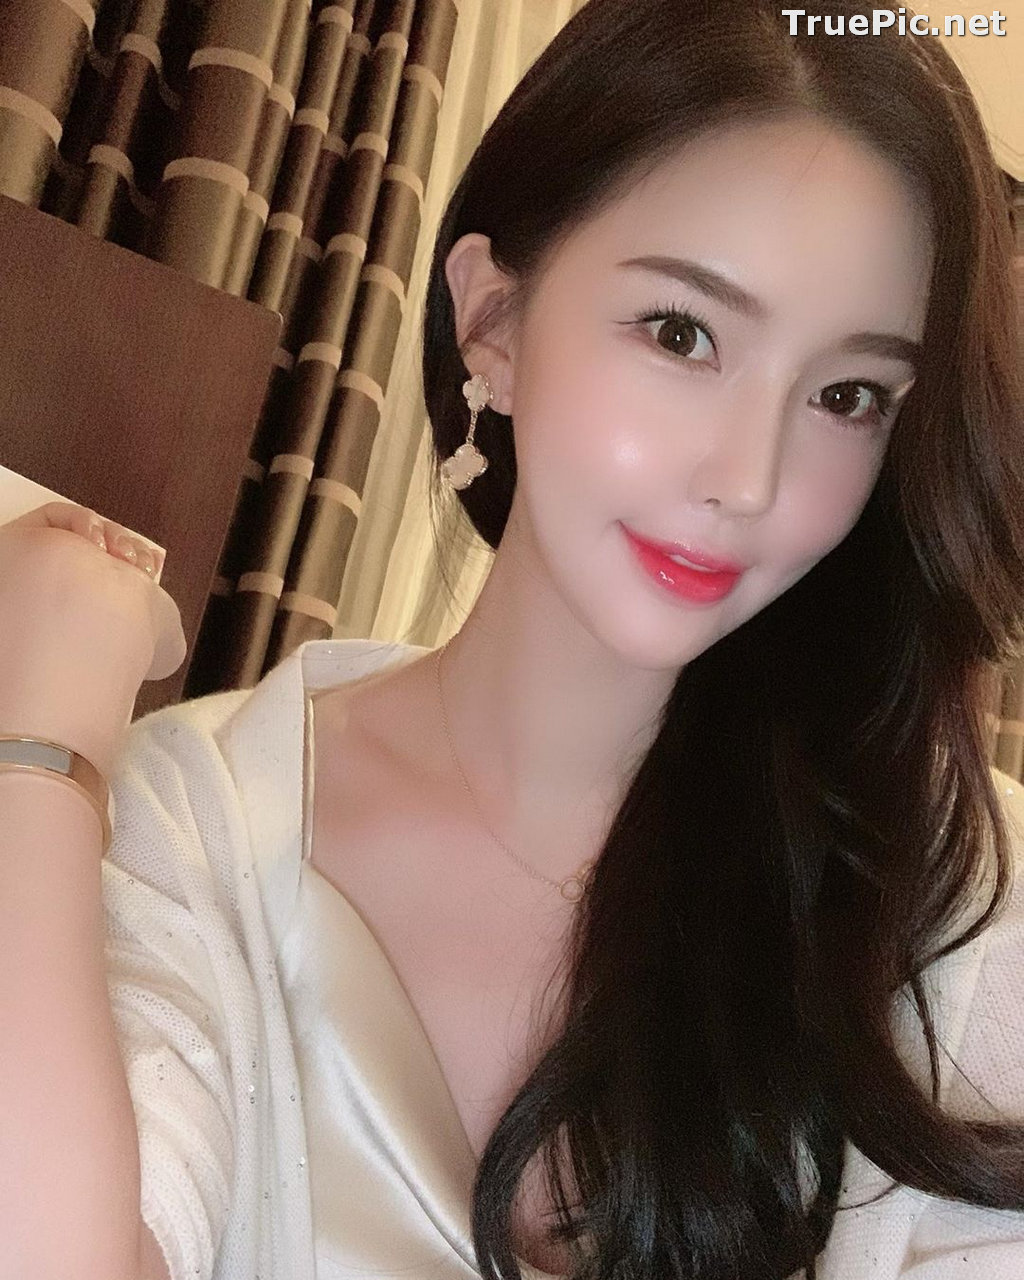 Image Korean Sexy Model - Choi Byeol Ha (최별하) Hot Photos 2020 - TruePic.net - Picture-5